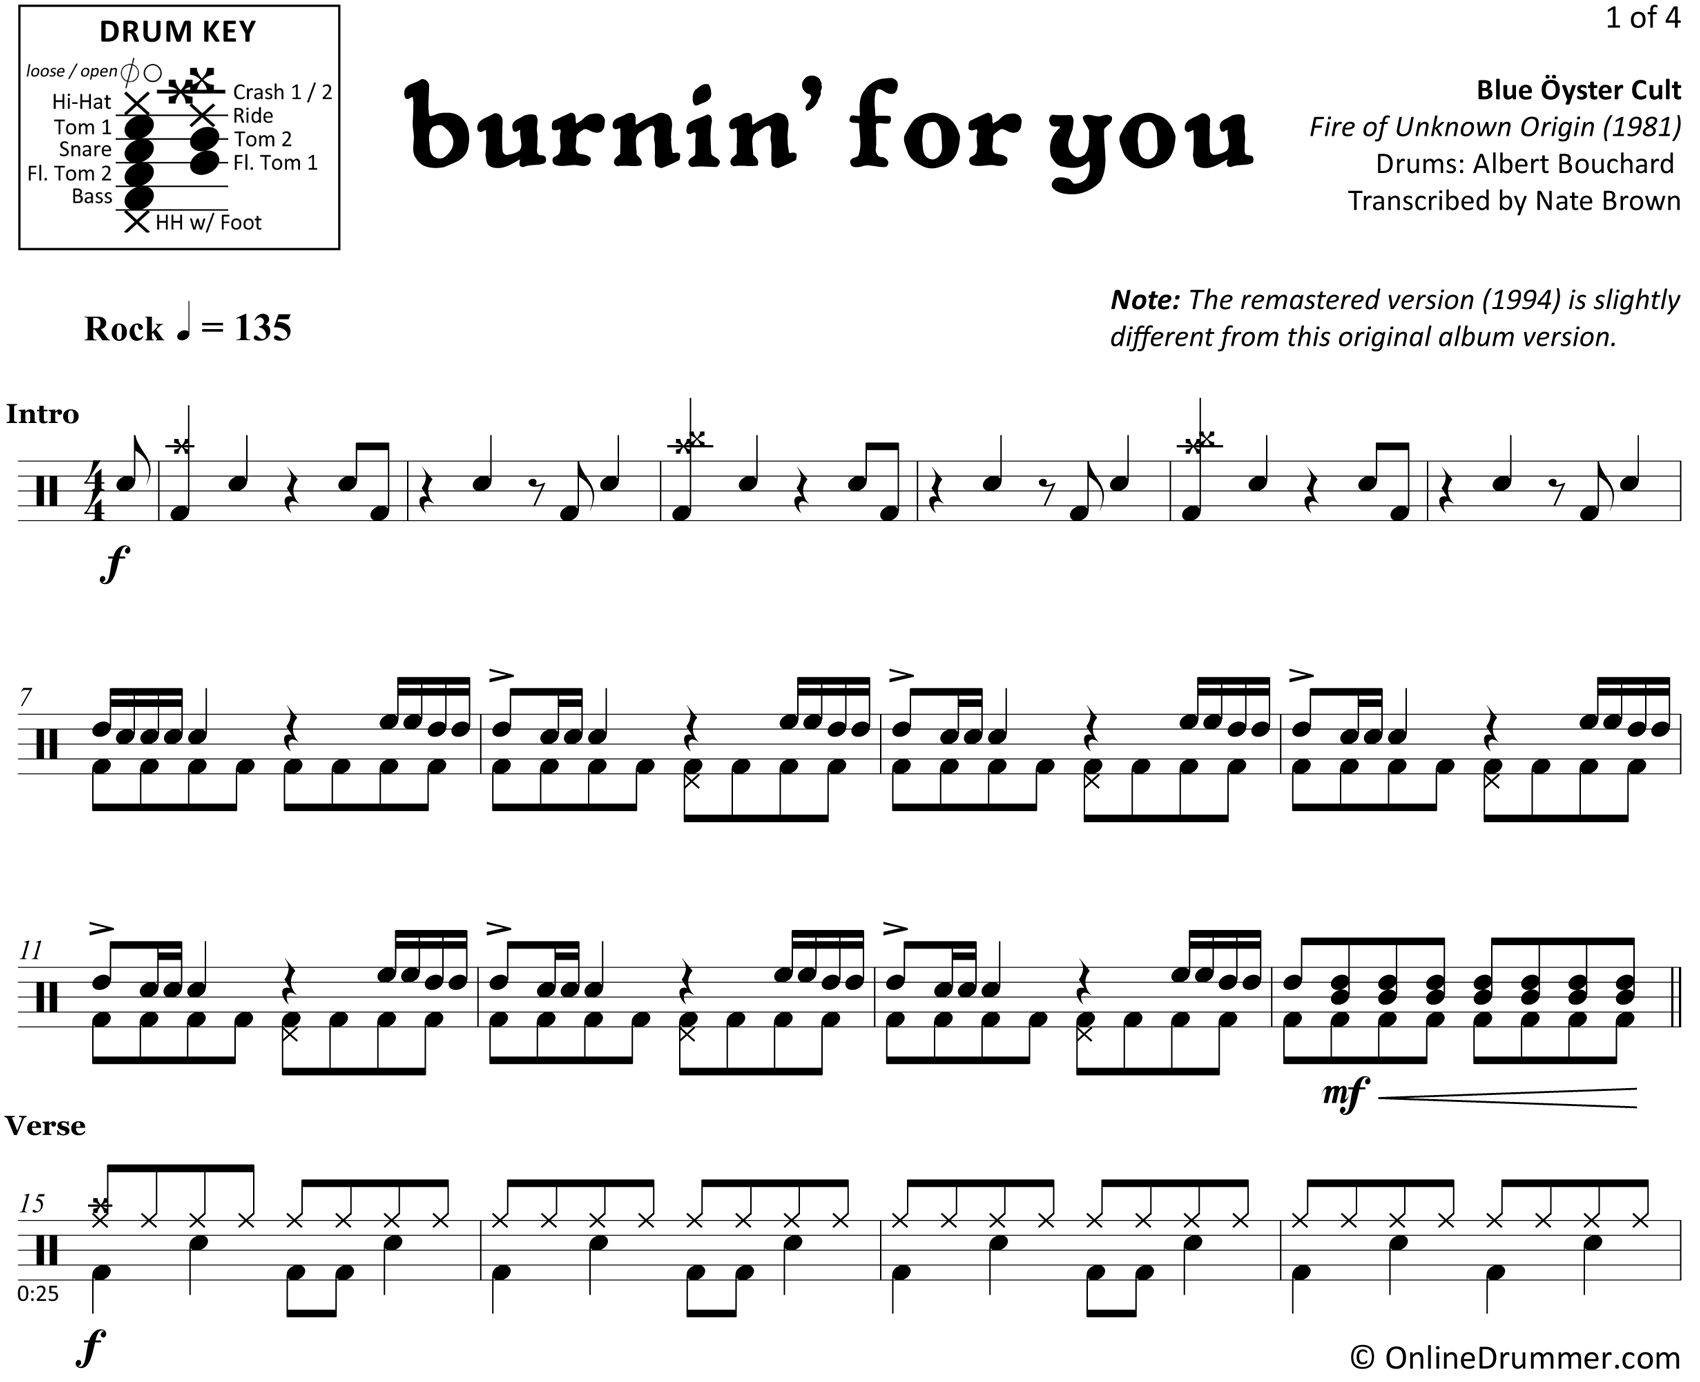 Burnin' for You - Blue Öyster Cult - Drum Sheet Music